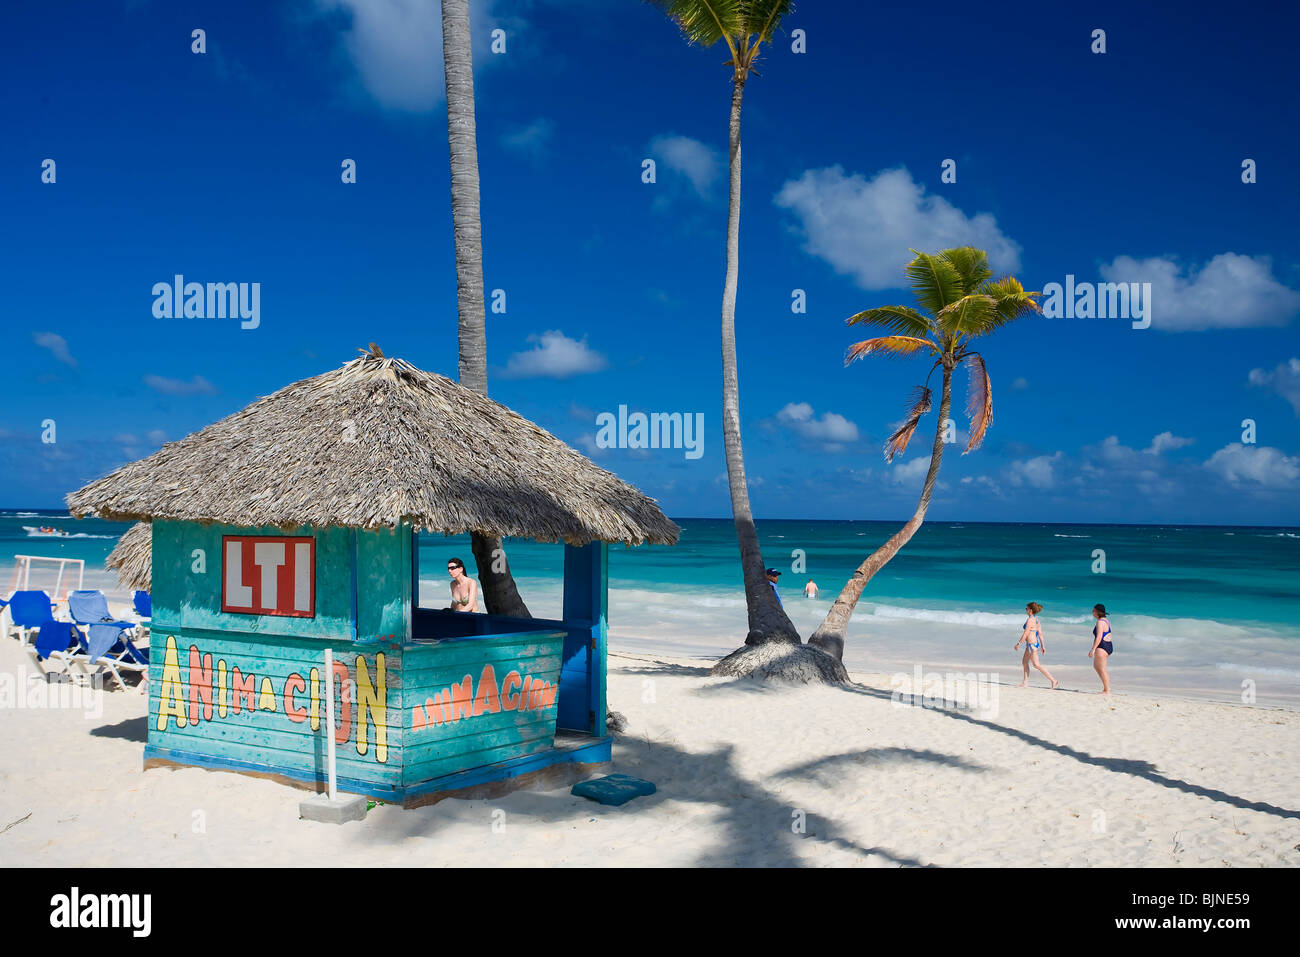 Playa Bávaro, Punta Cana, República Dominicana Imagen De Stock